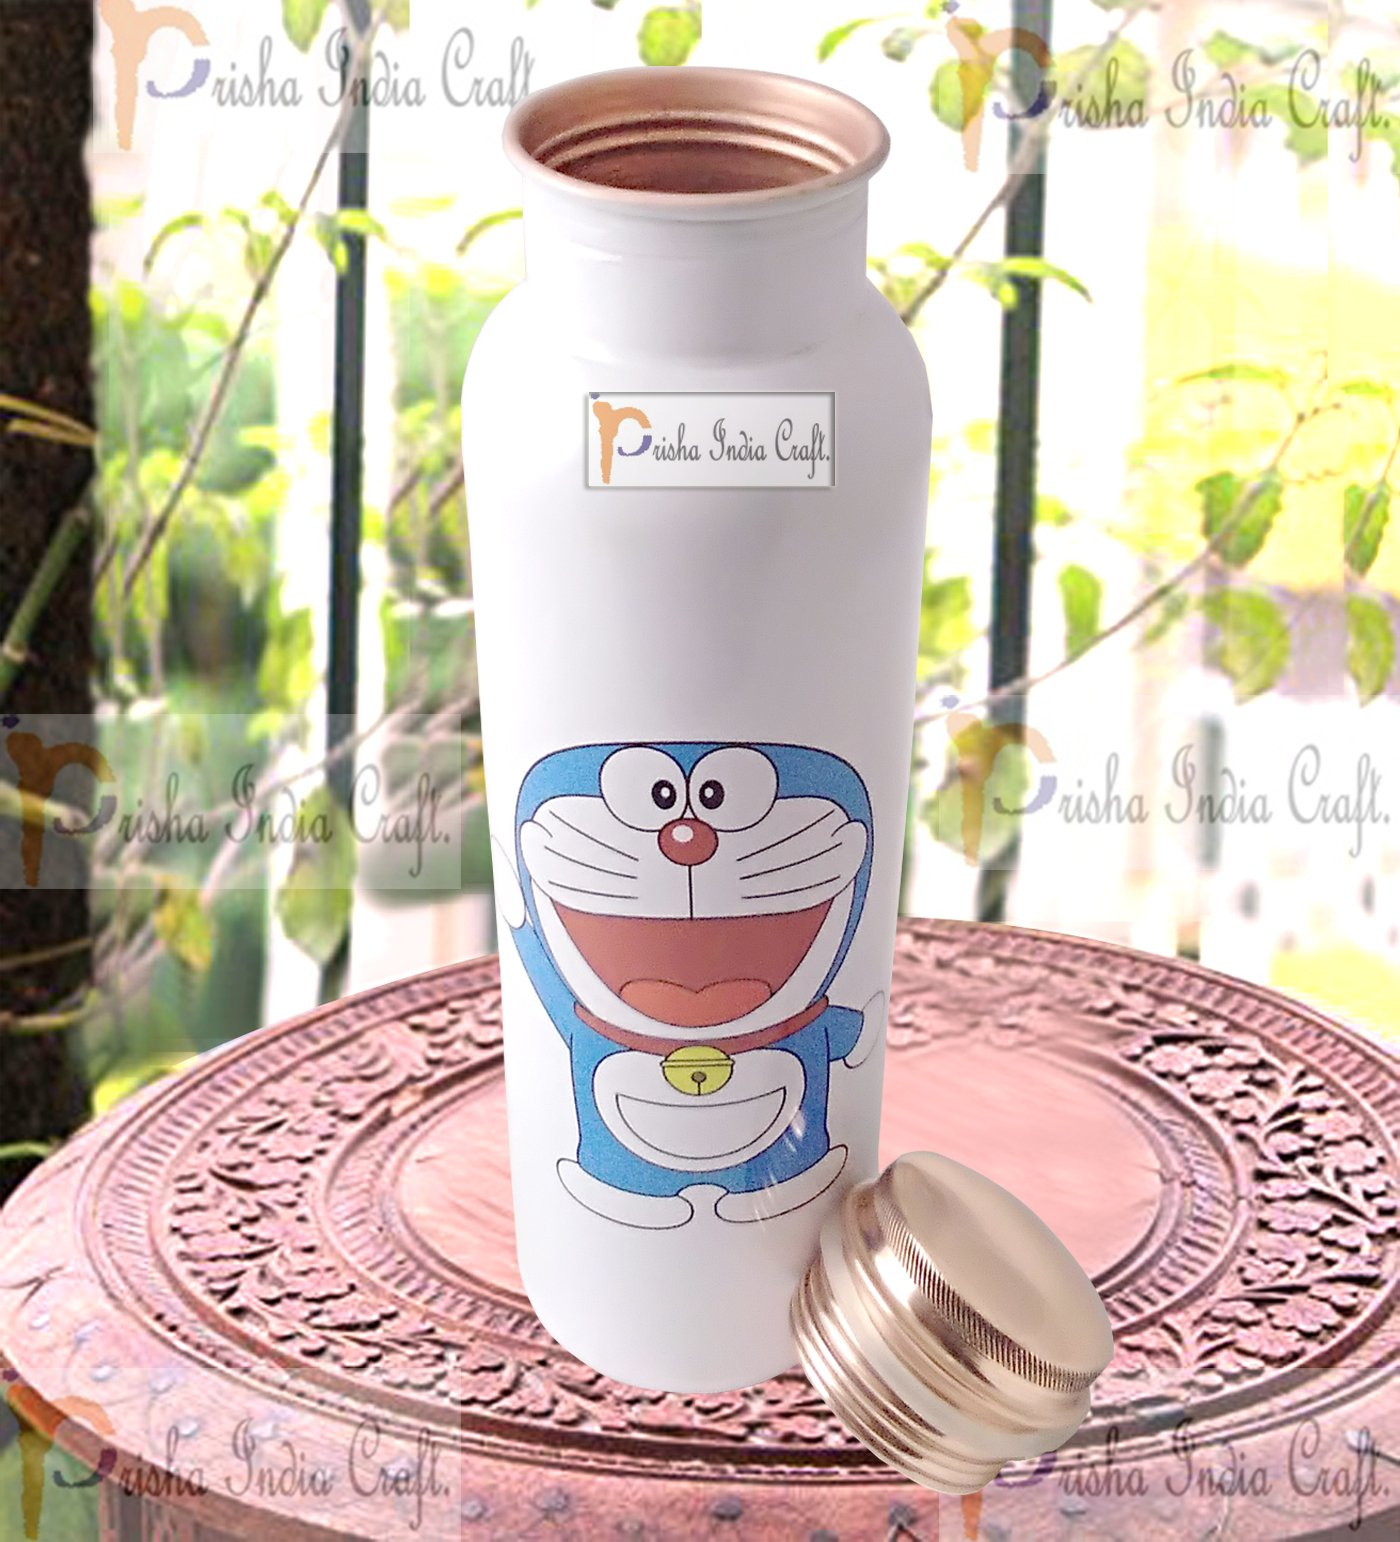 Prisha India Craft Digital Printed Pure Copper Water Bottle Kids School Water Bottle - Doremon Design, 1000 ML